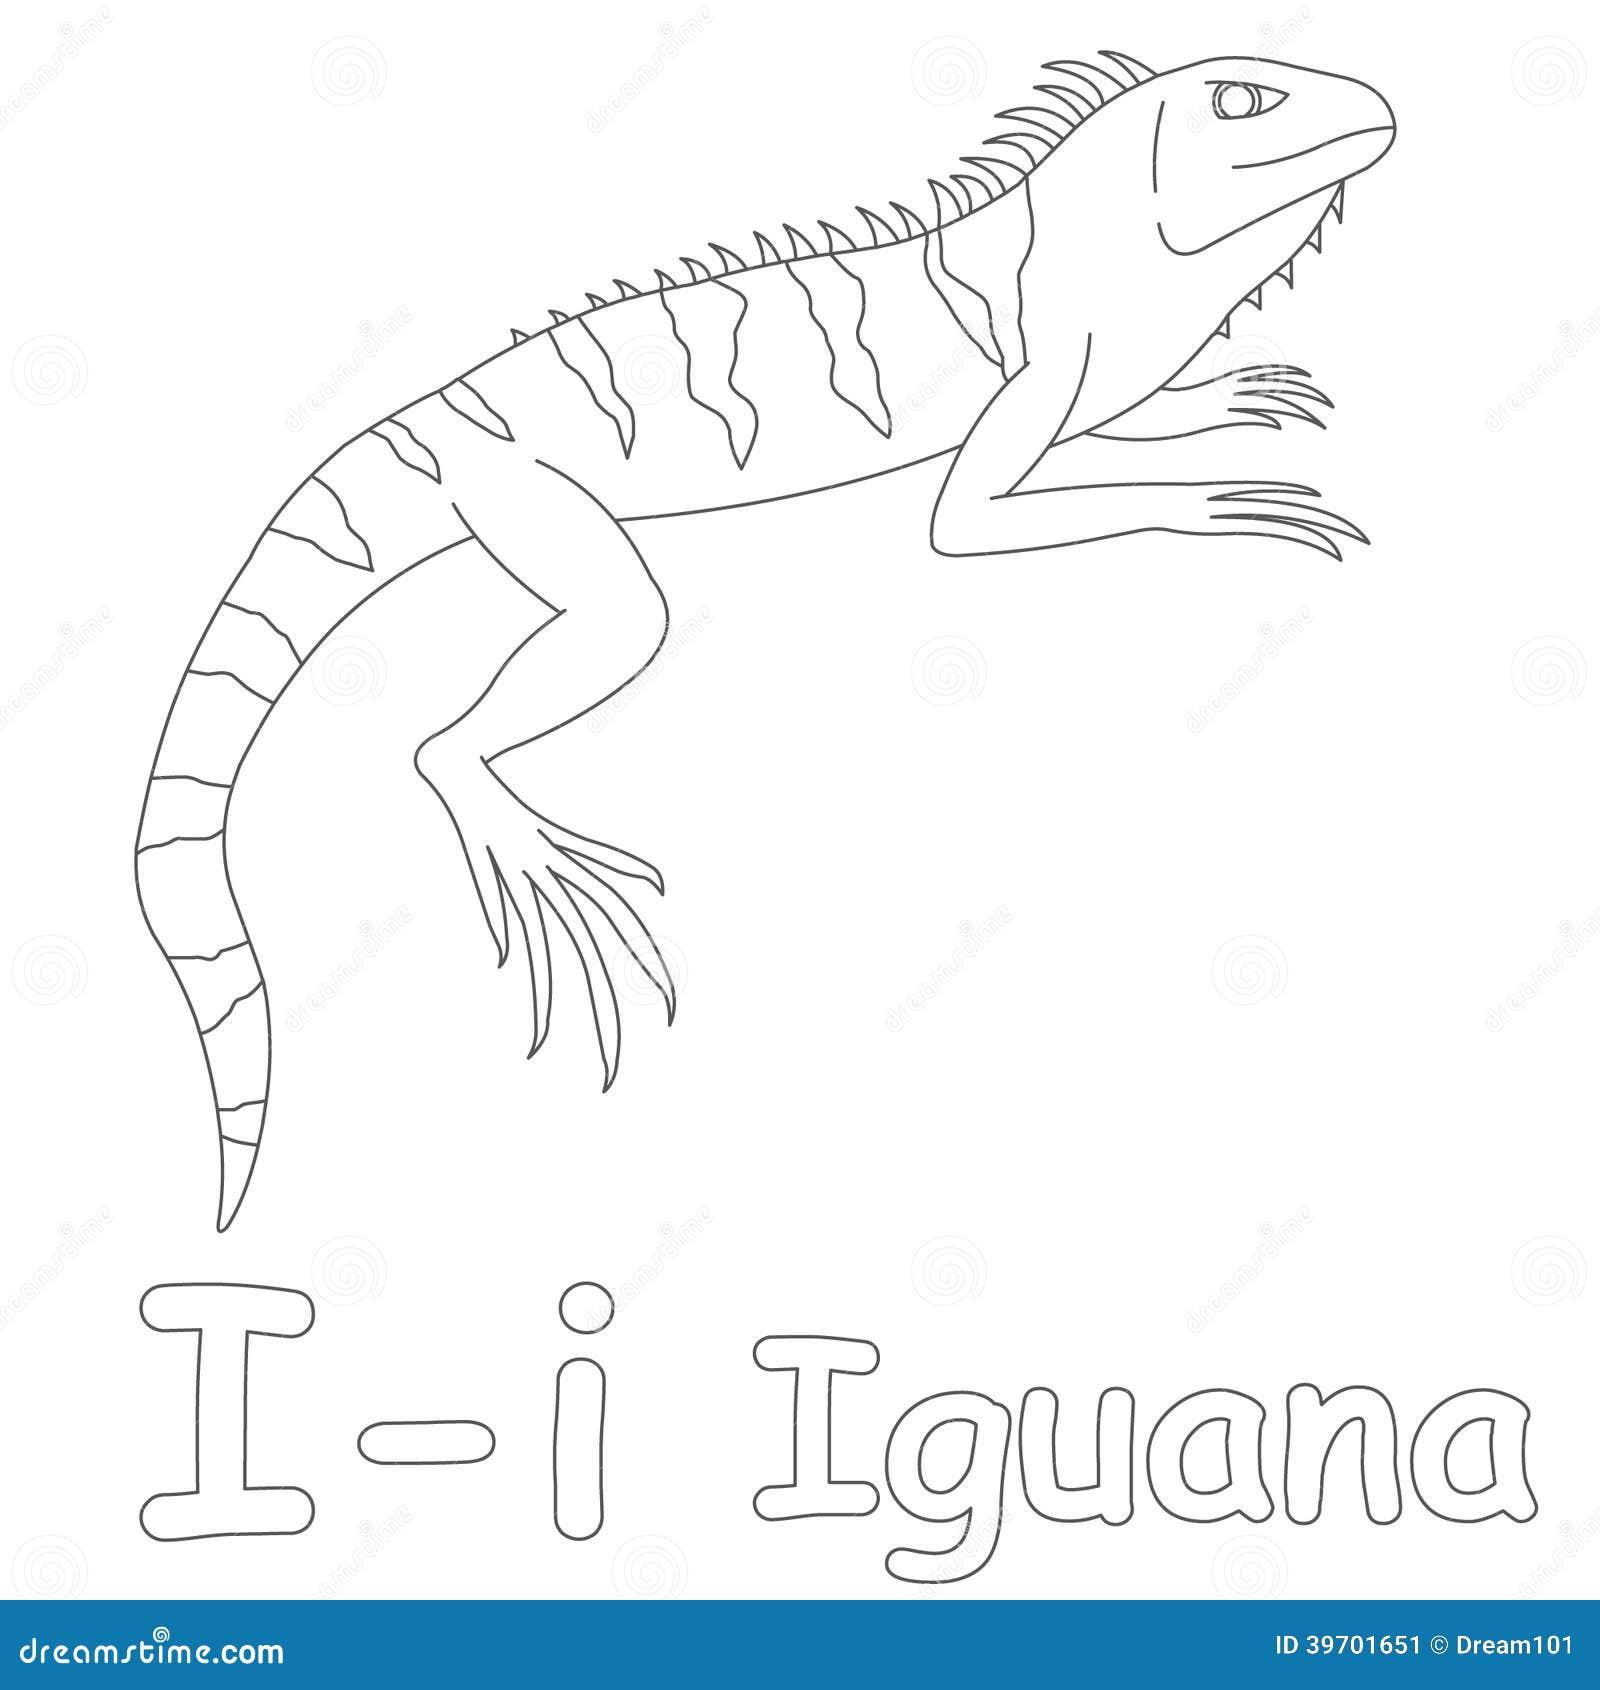 i for iguana coloring page stock illustration illustration of